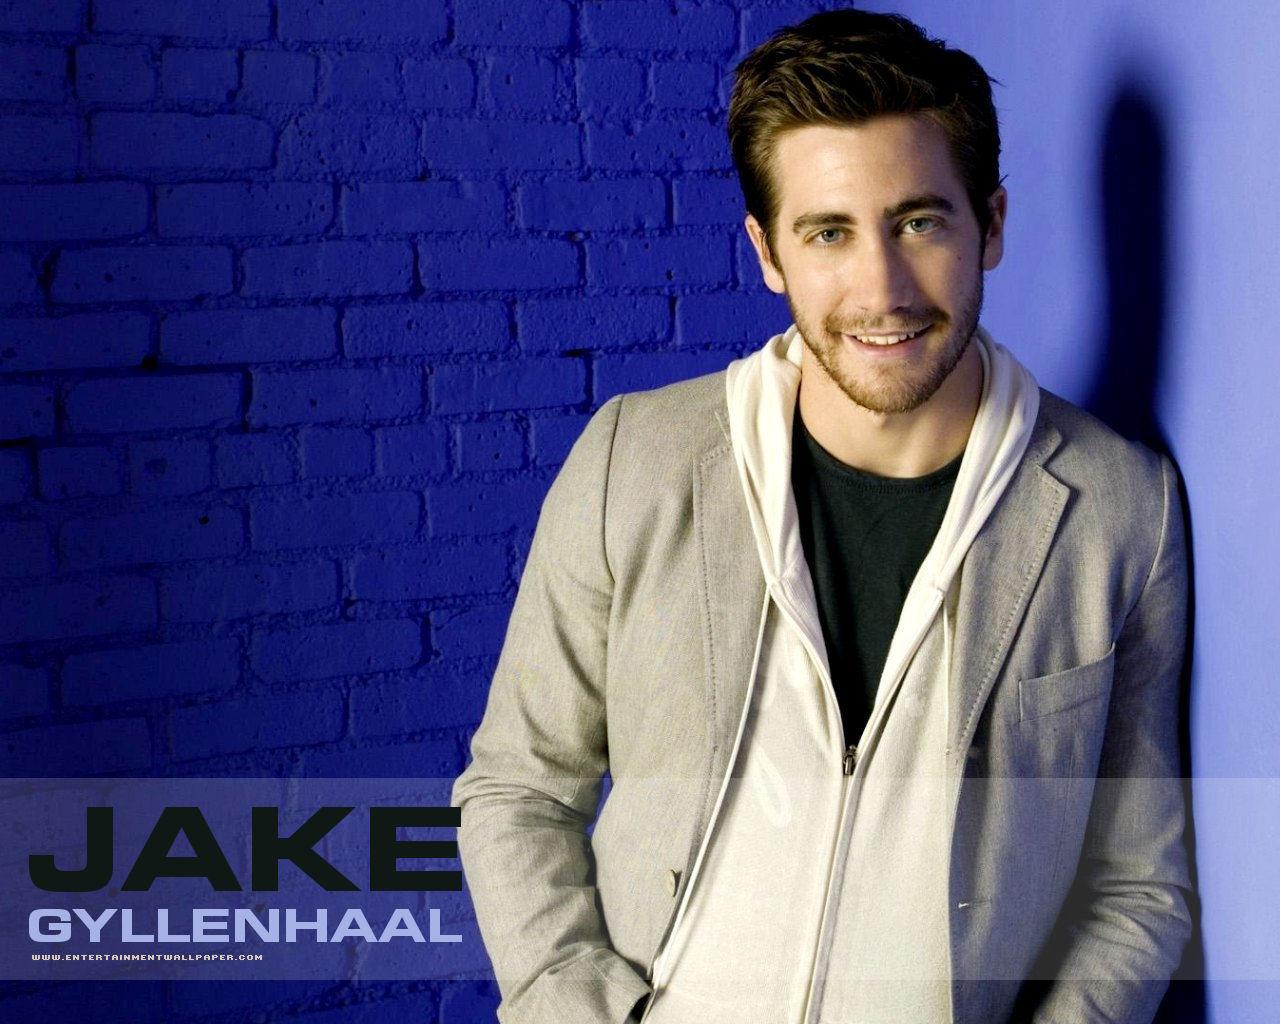 Jake jake gyllenhaal